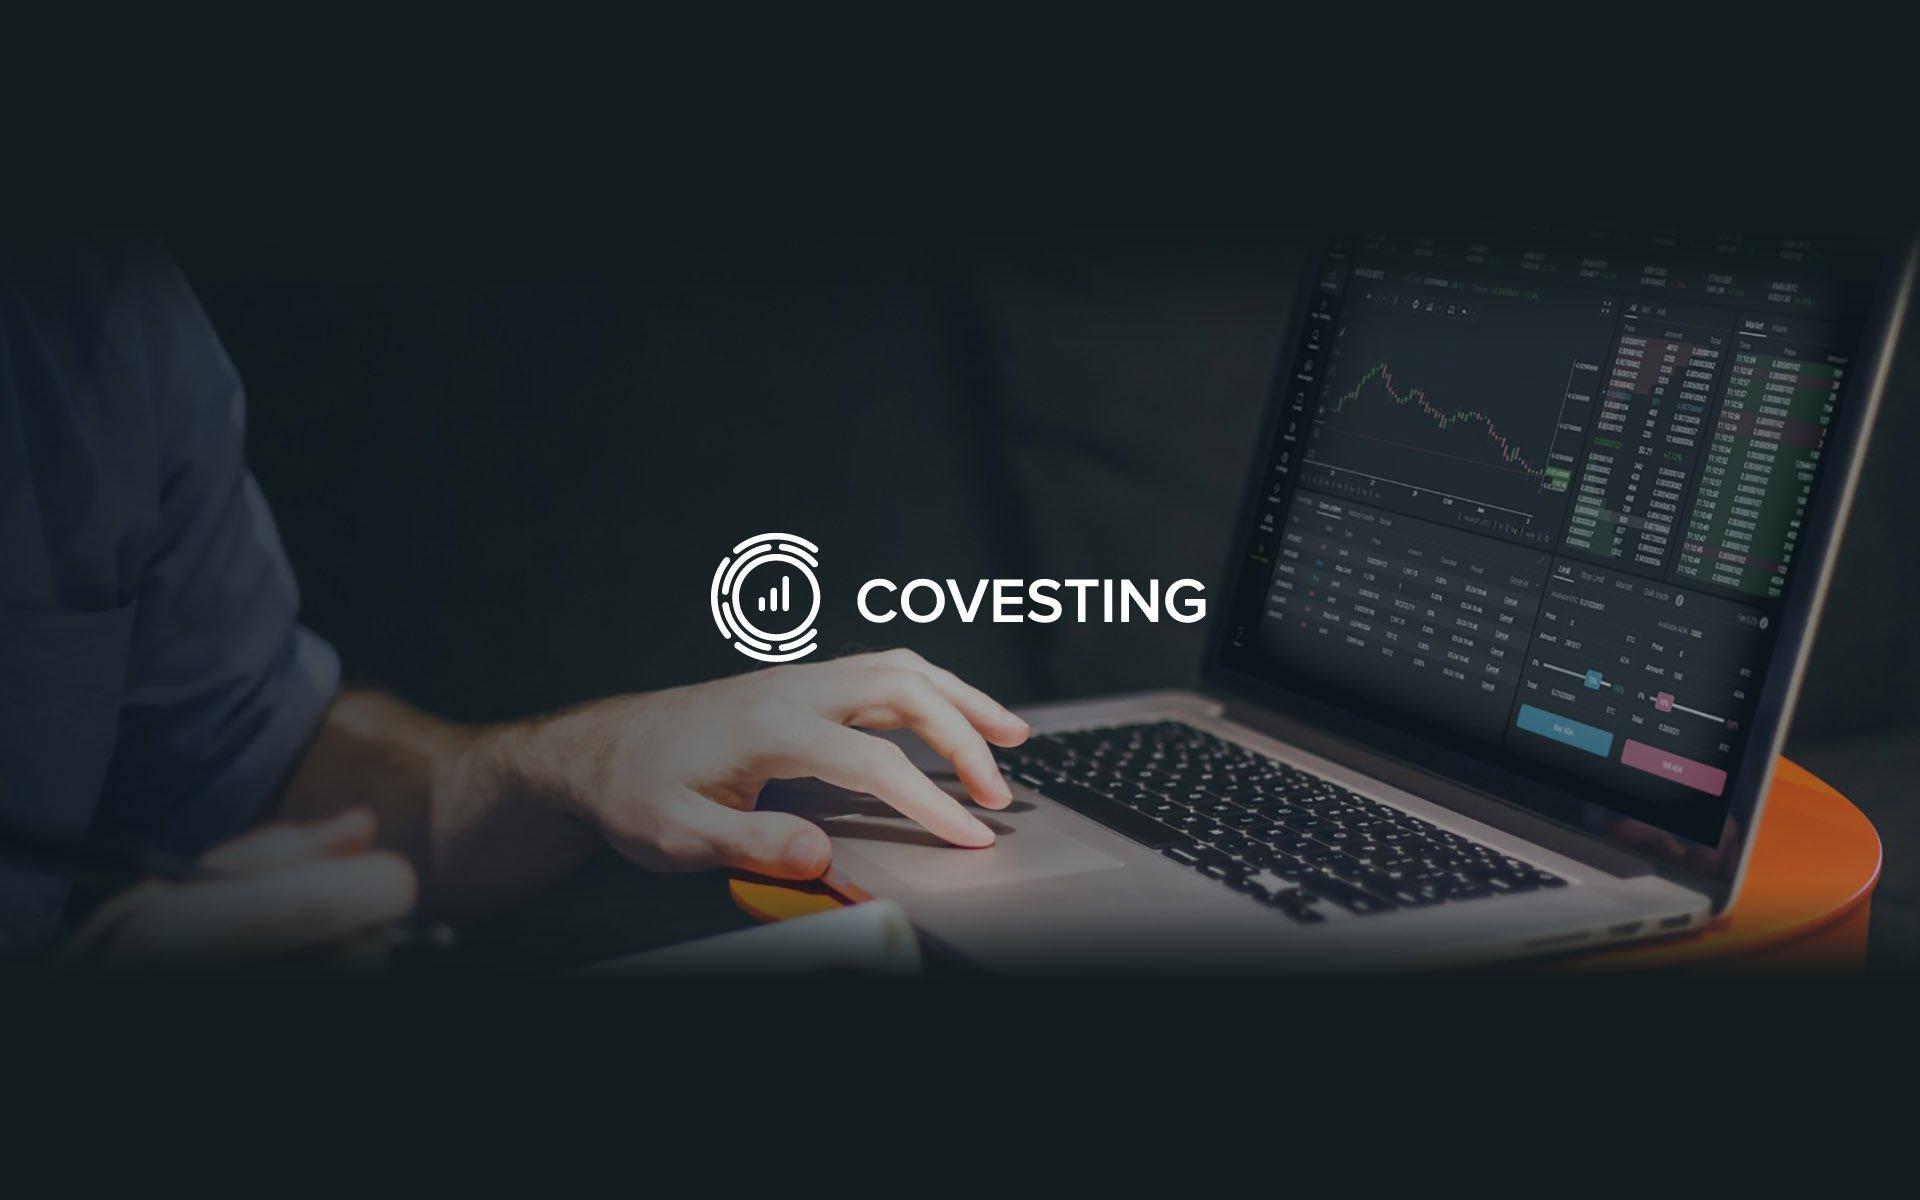 Covesting Invites Everyone to Test Their Platform